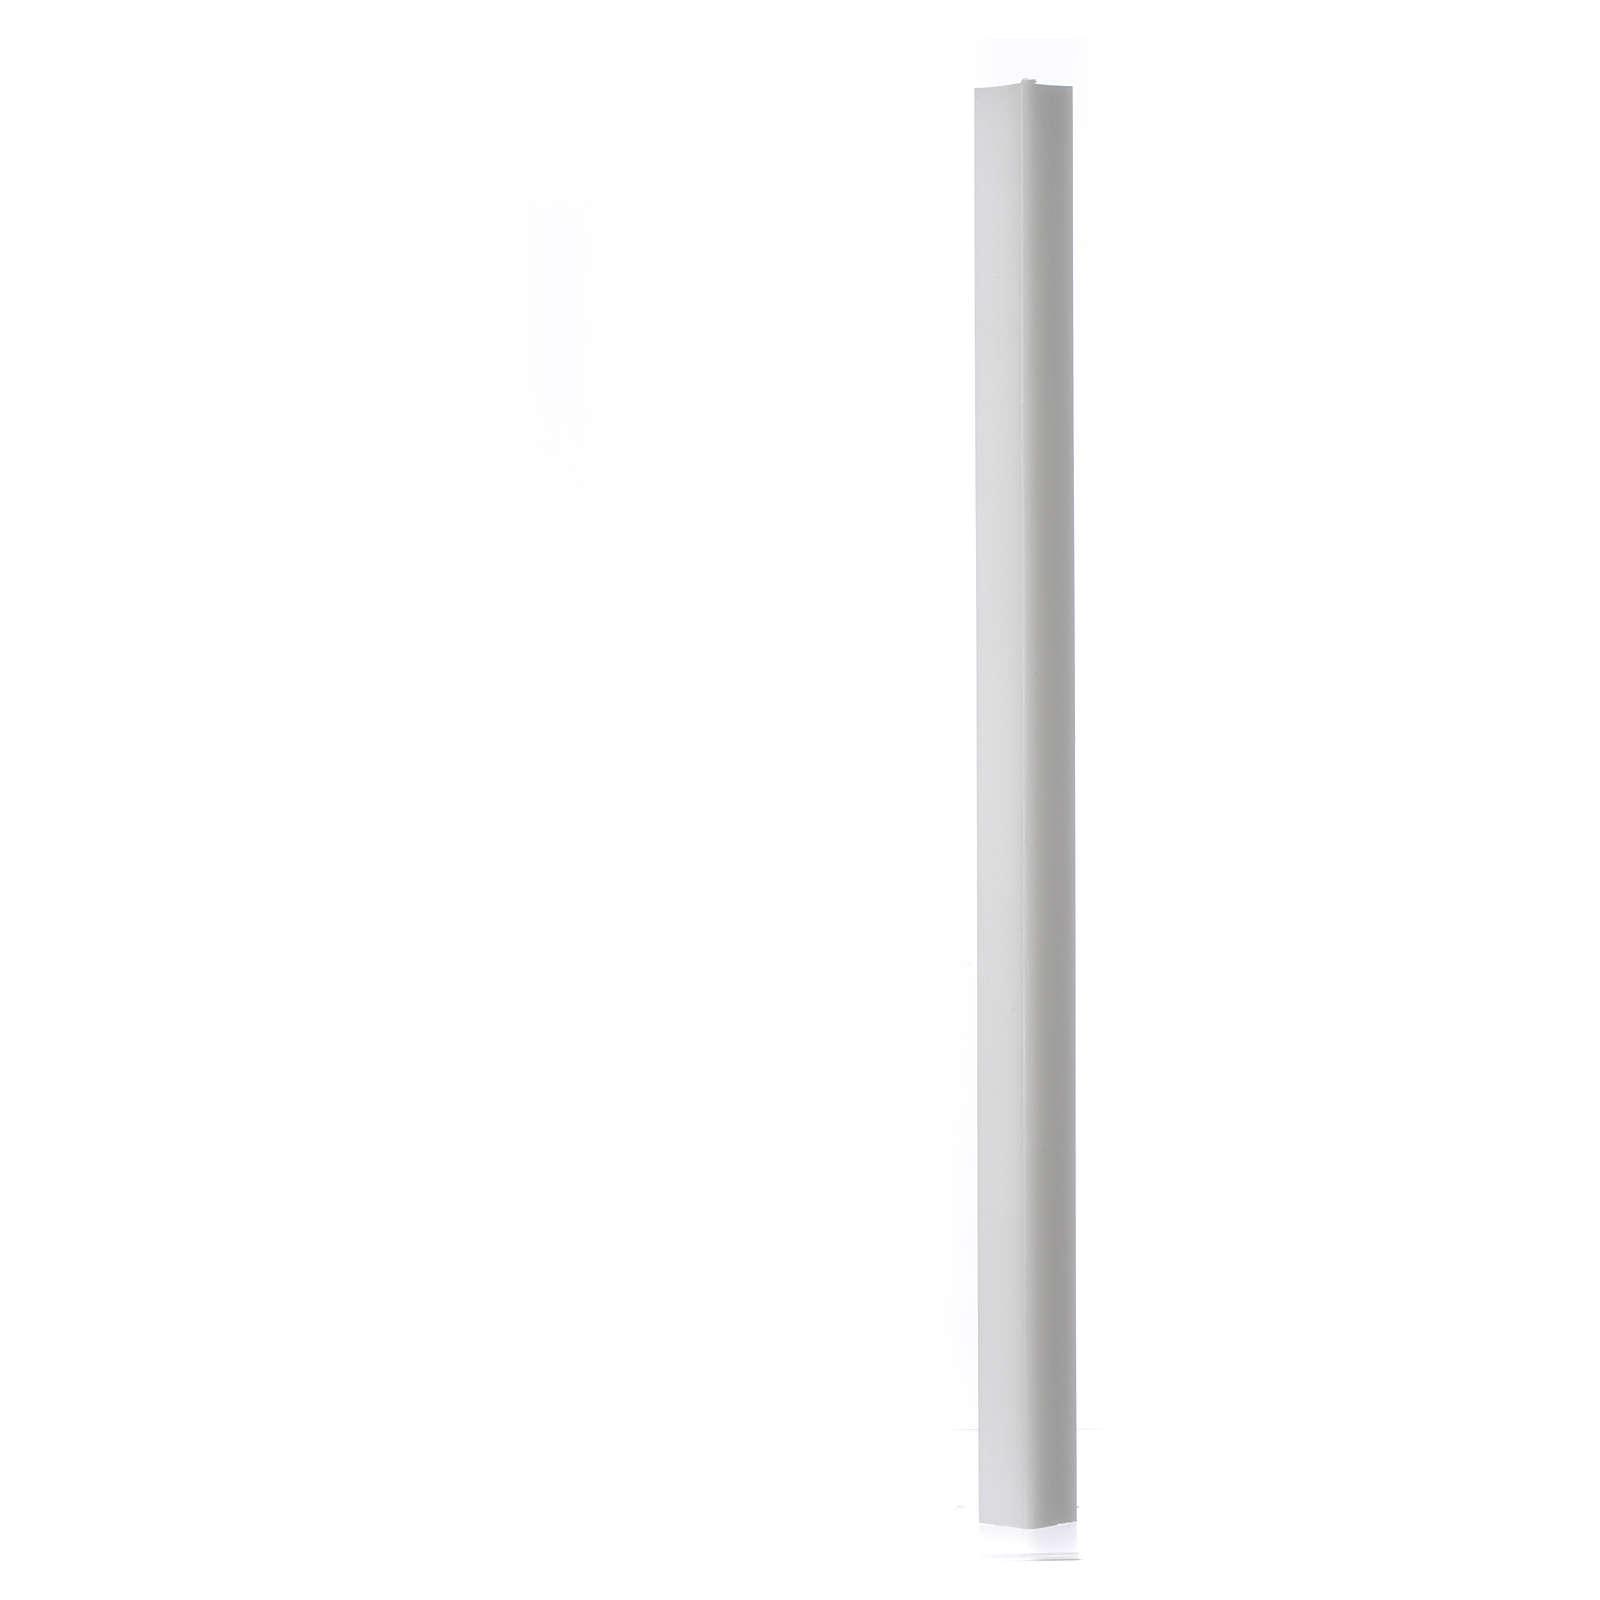 Candela bianca quadra 600x30x30 mm (confezione) 3